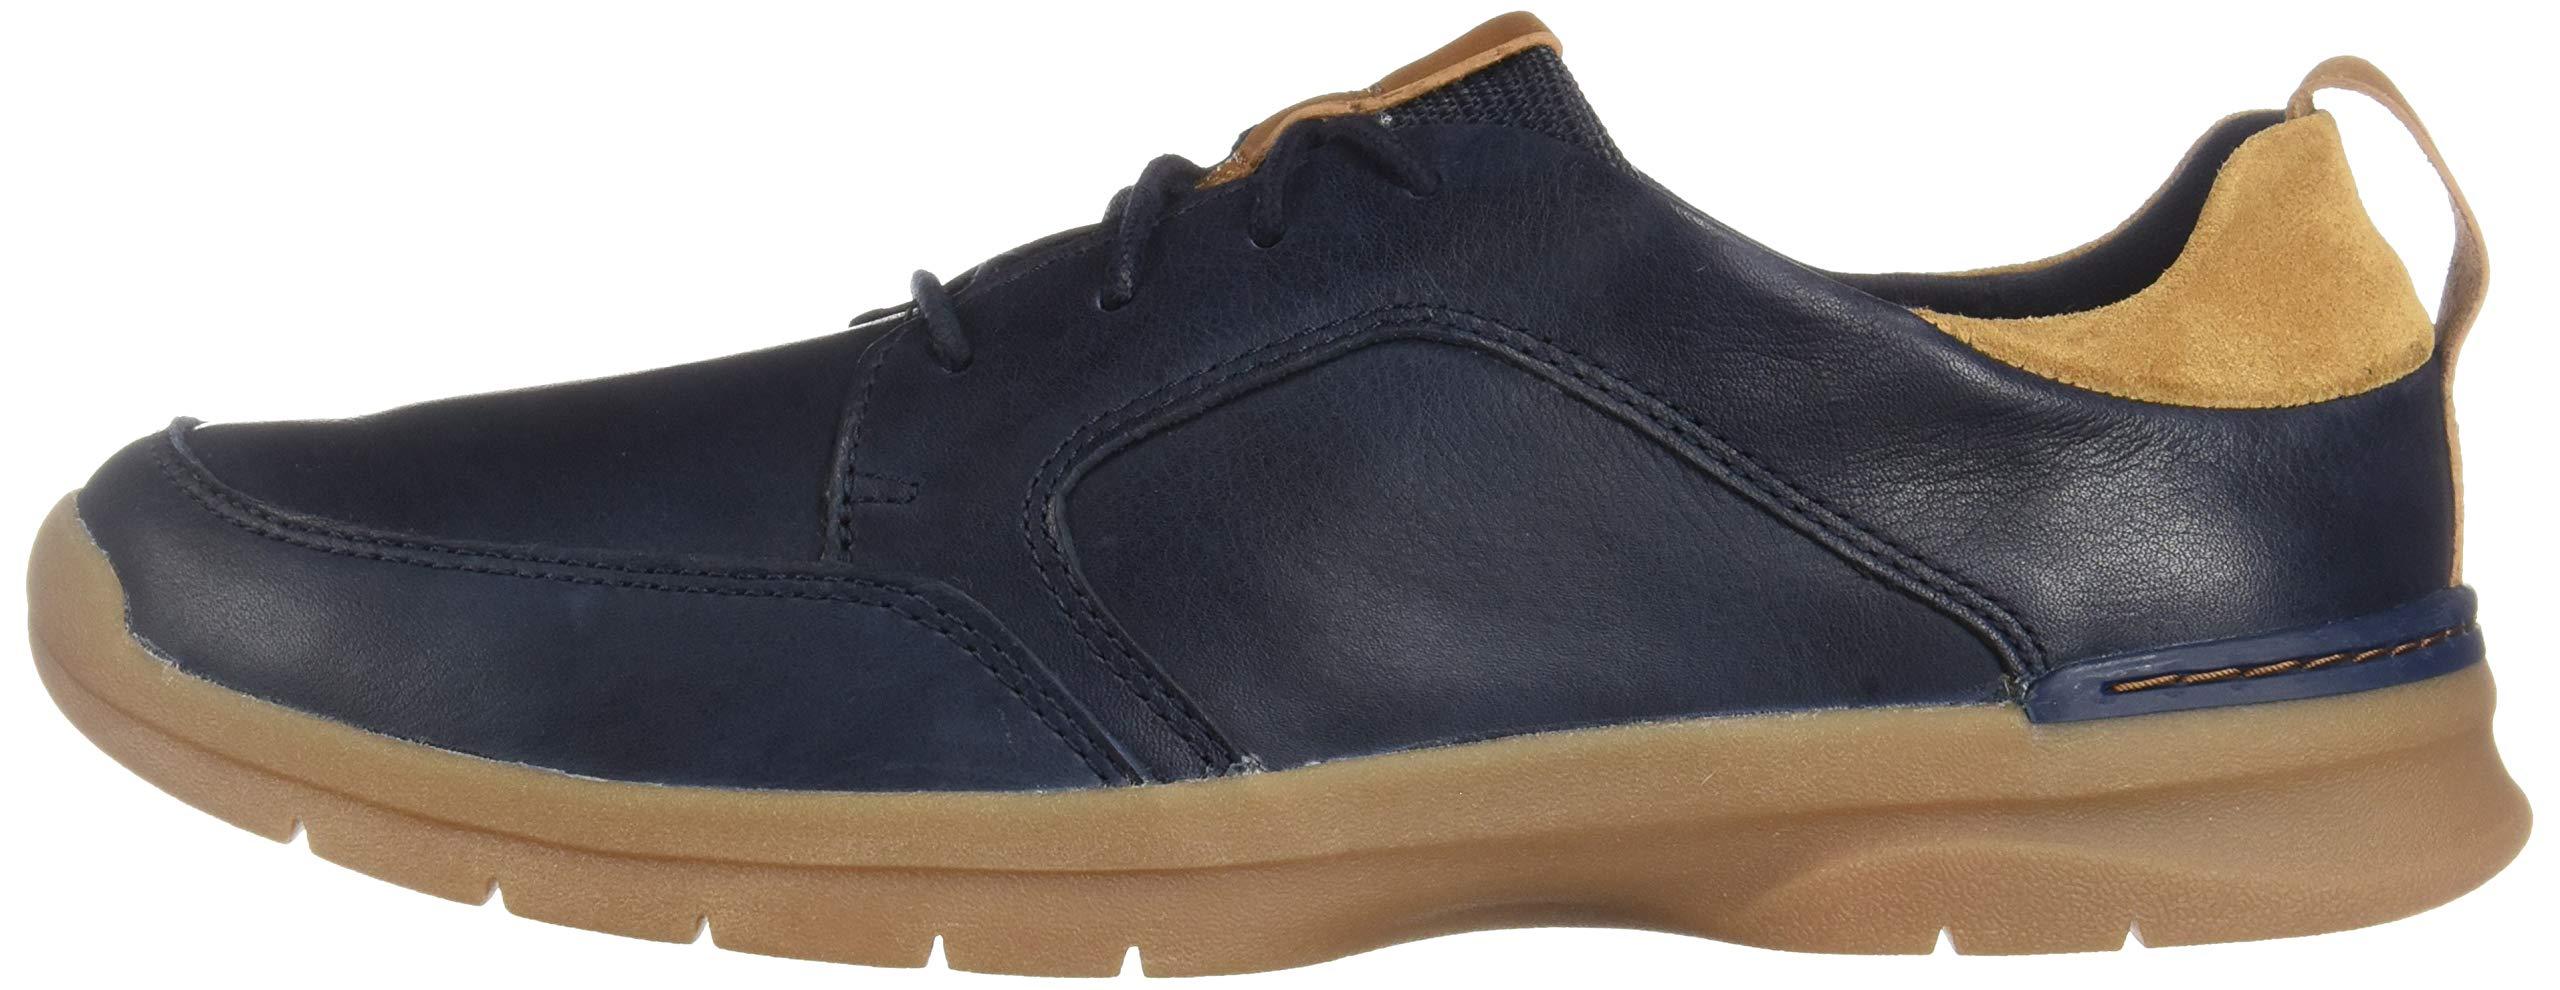 070 Navy Leather CLARKS Men/'s Orlin Vibe Sneaker Choose SZ//color